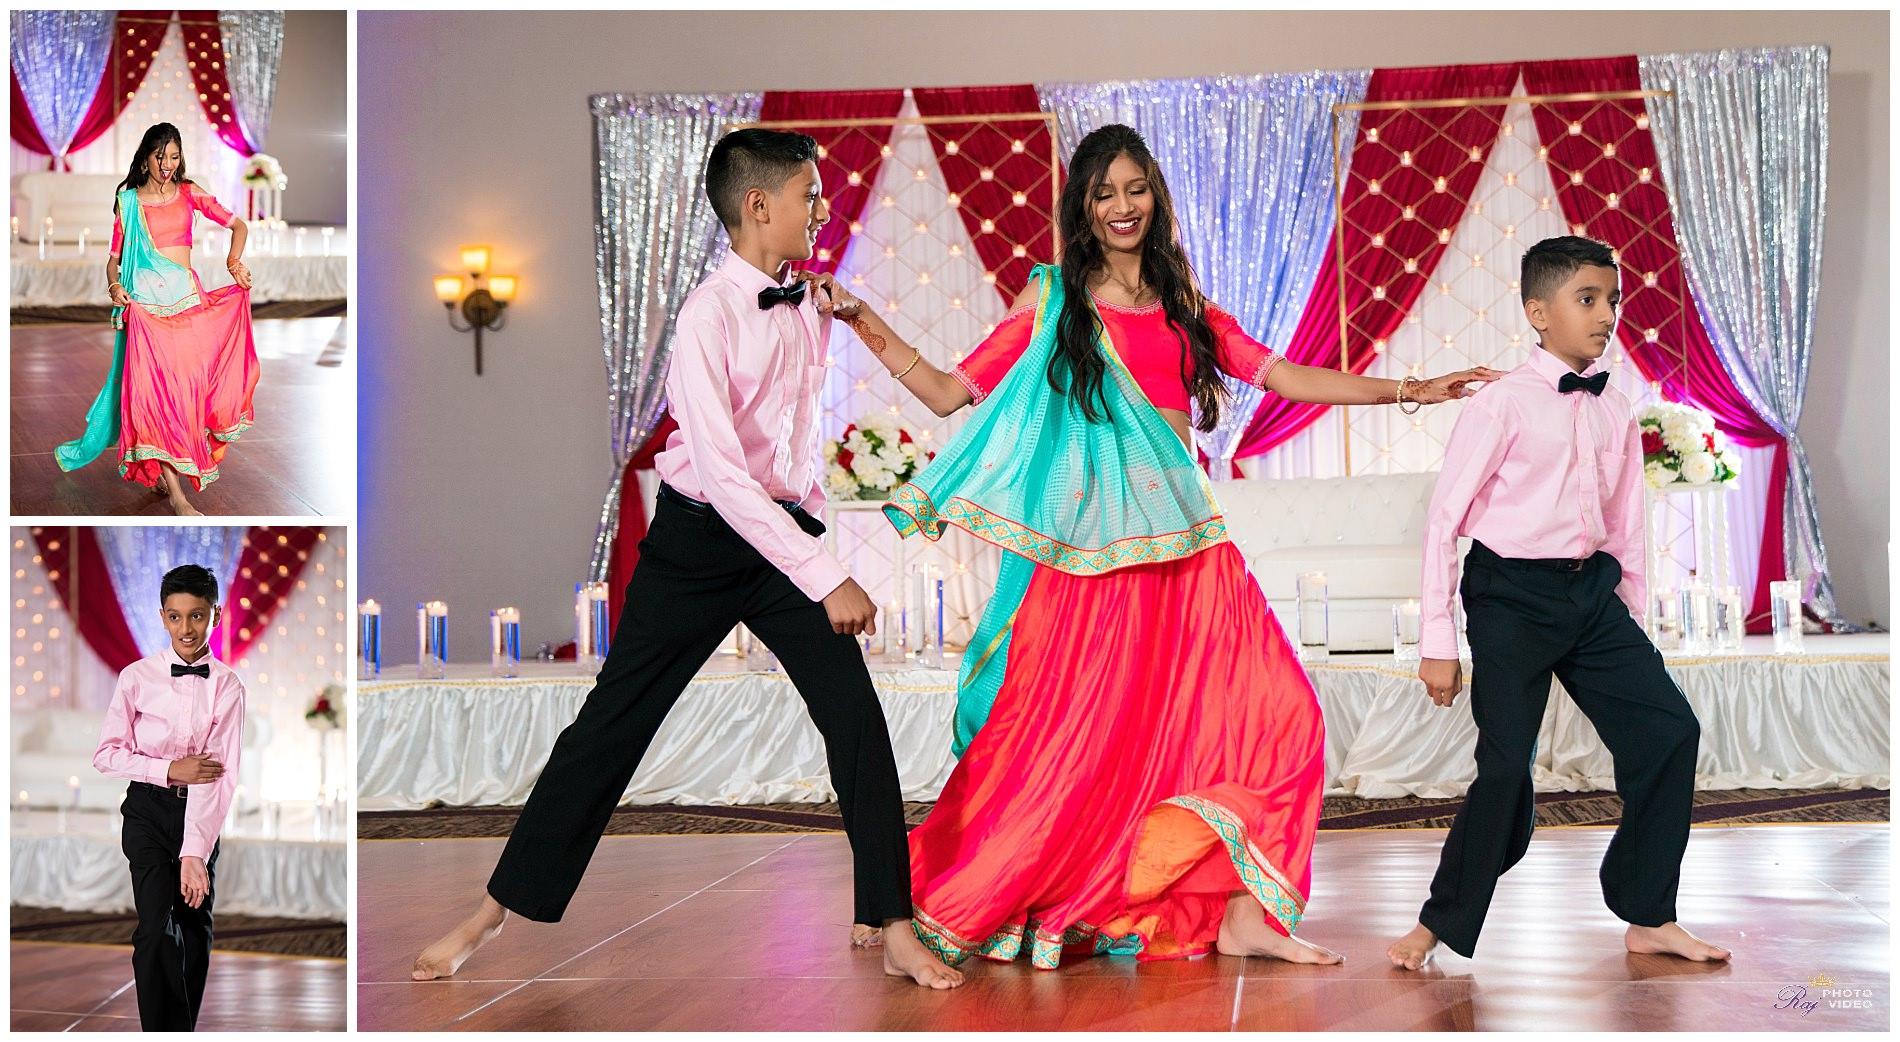 doubletree-by-hilton-hotel-wilmington-de-wedding-krishna-ritesh-103.jpg